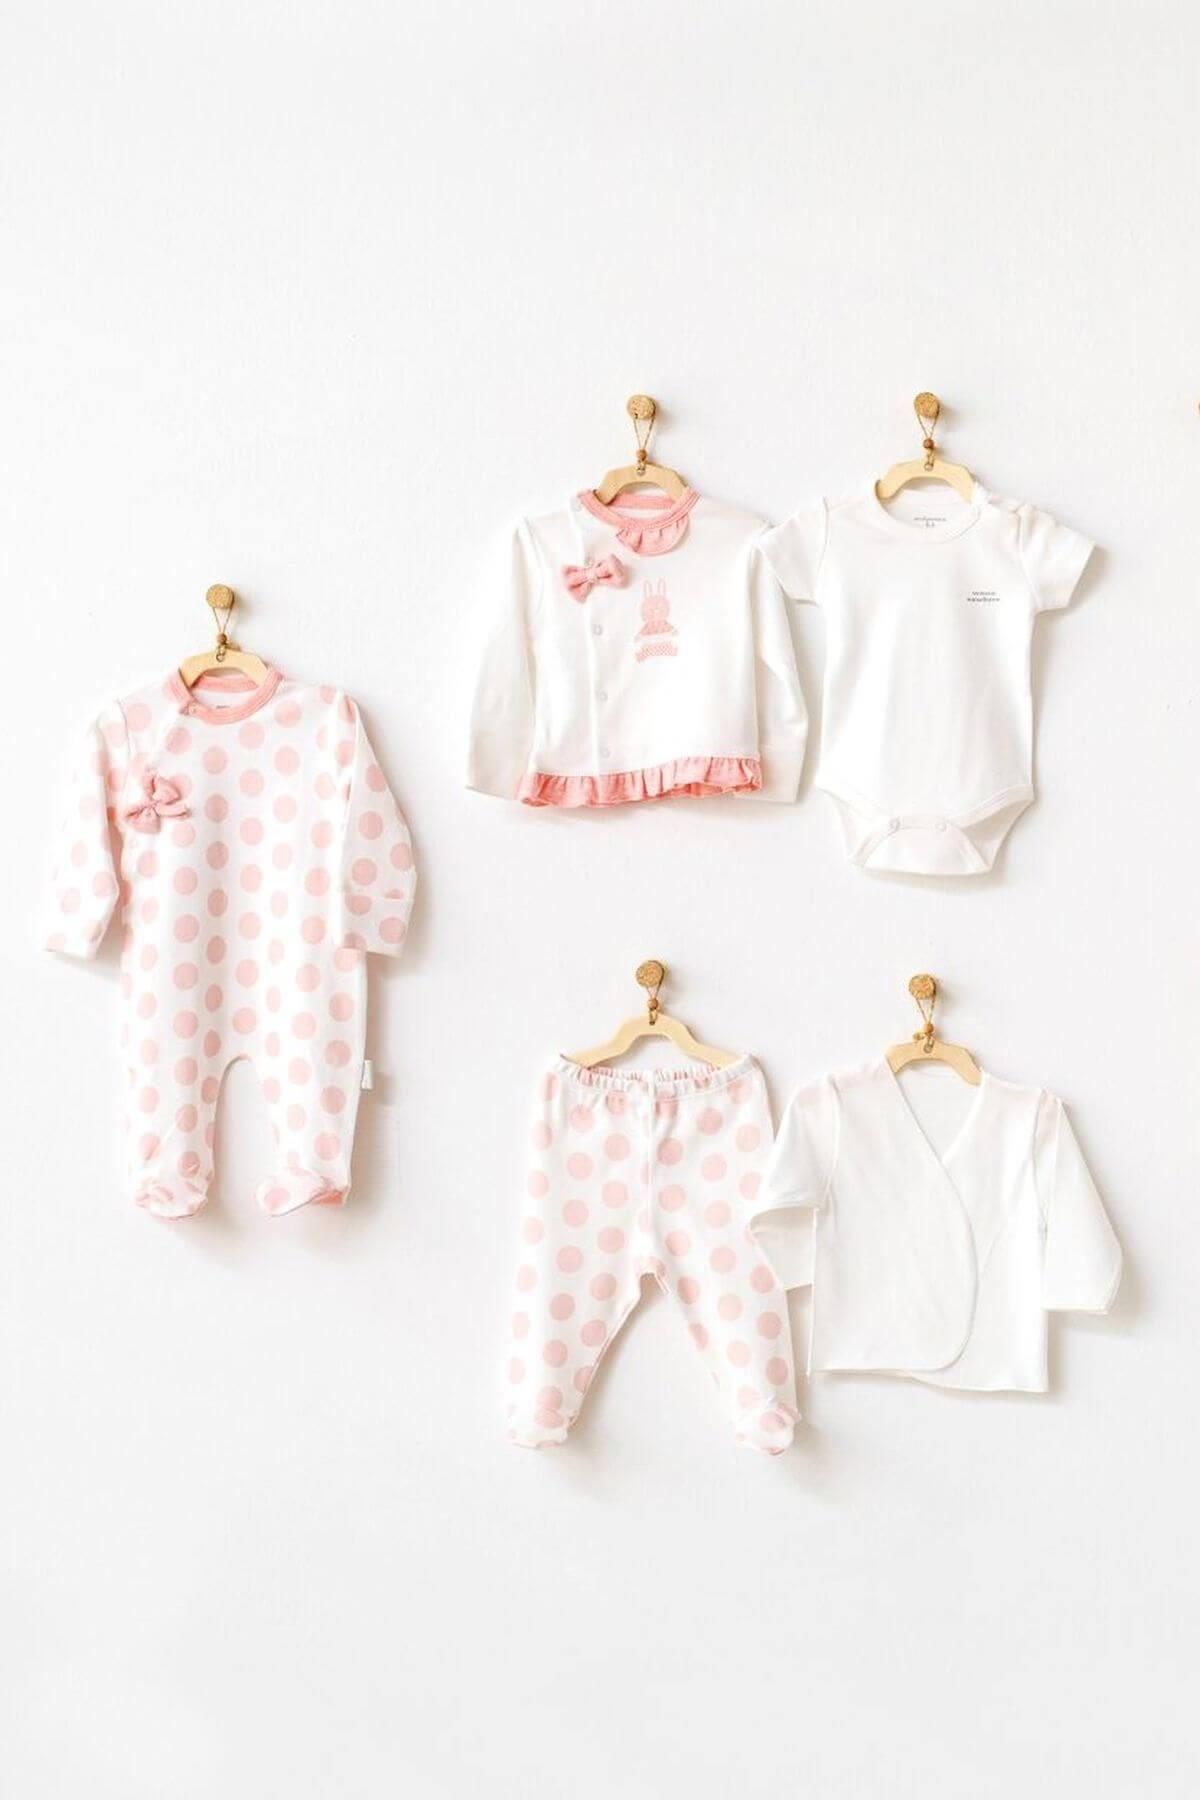 Andywawa AC21131 Polka Dot 10 Parça Zıbın Seti Bebek Hastane Çıkışı Ekru